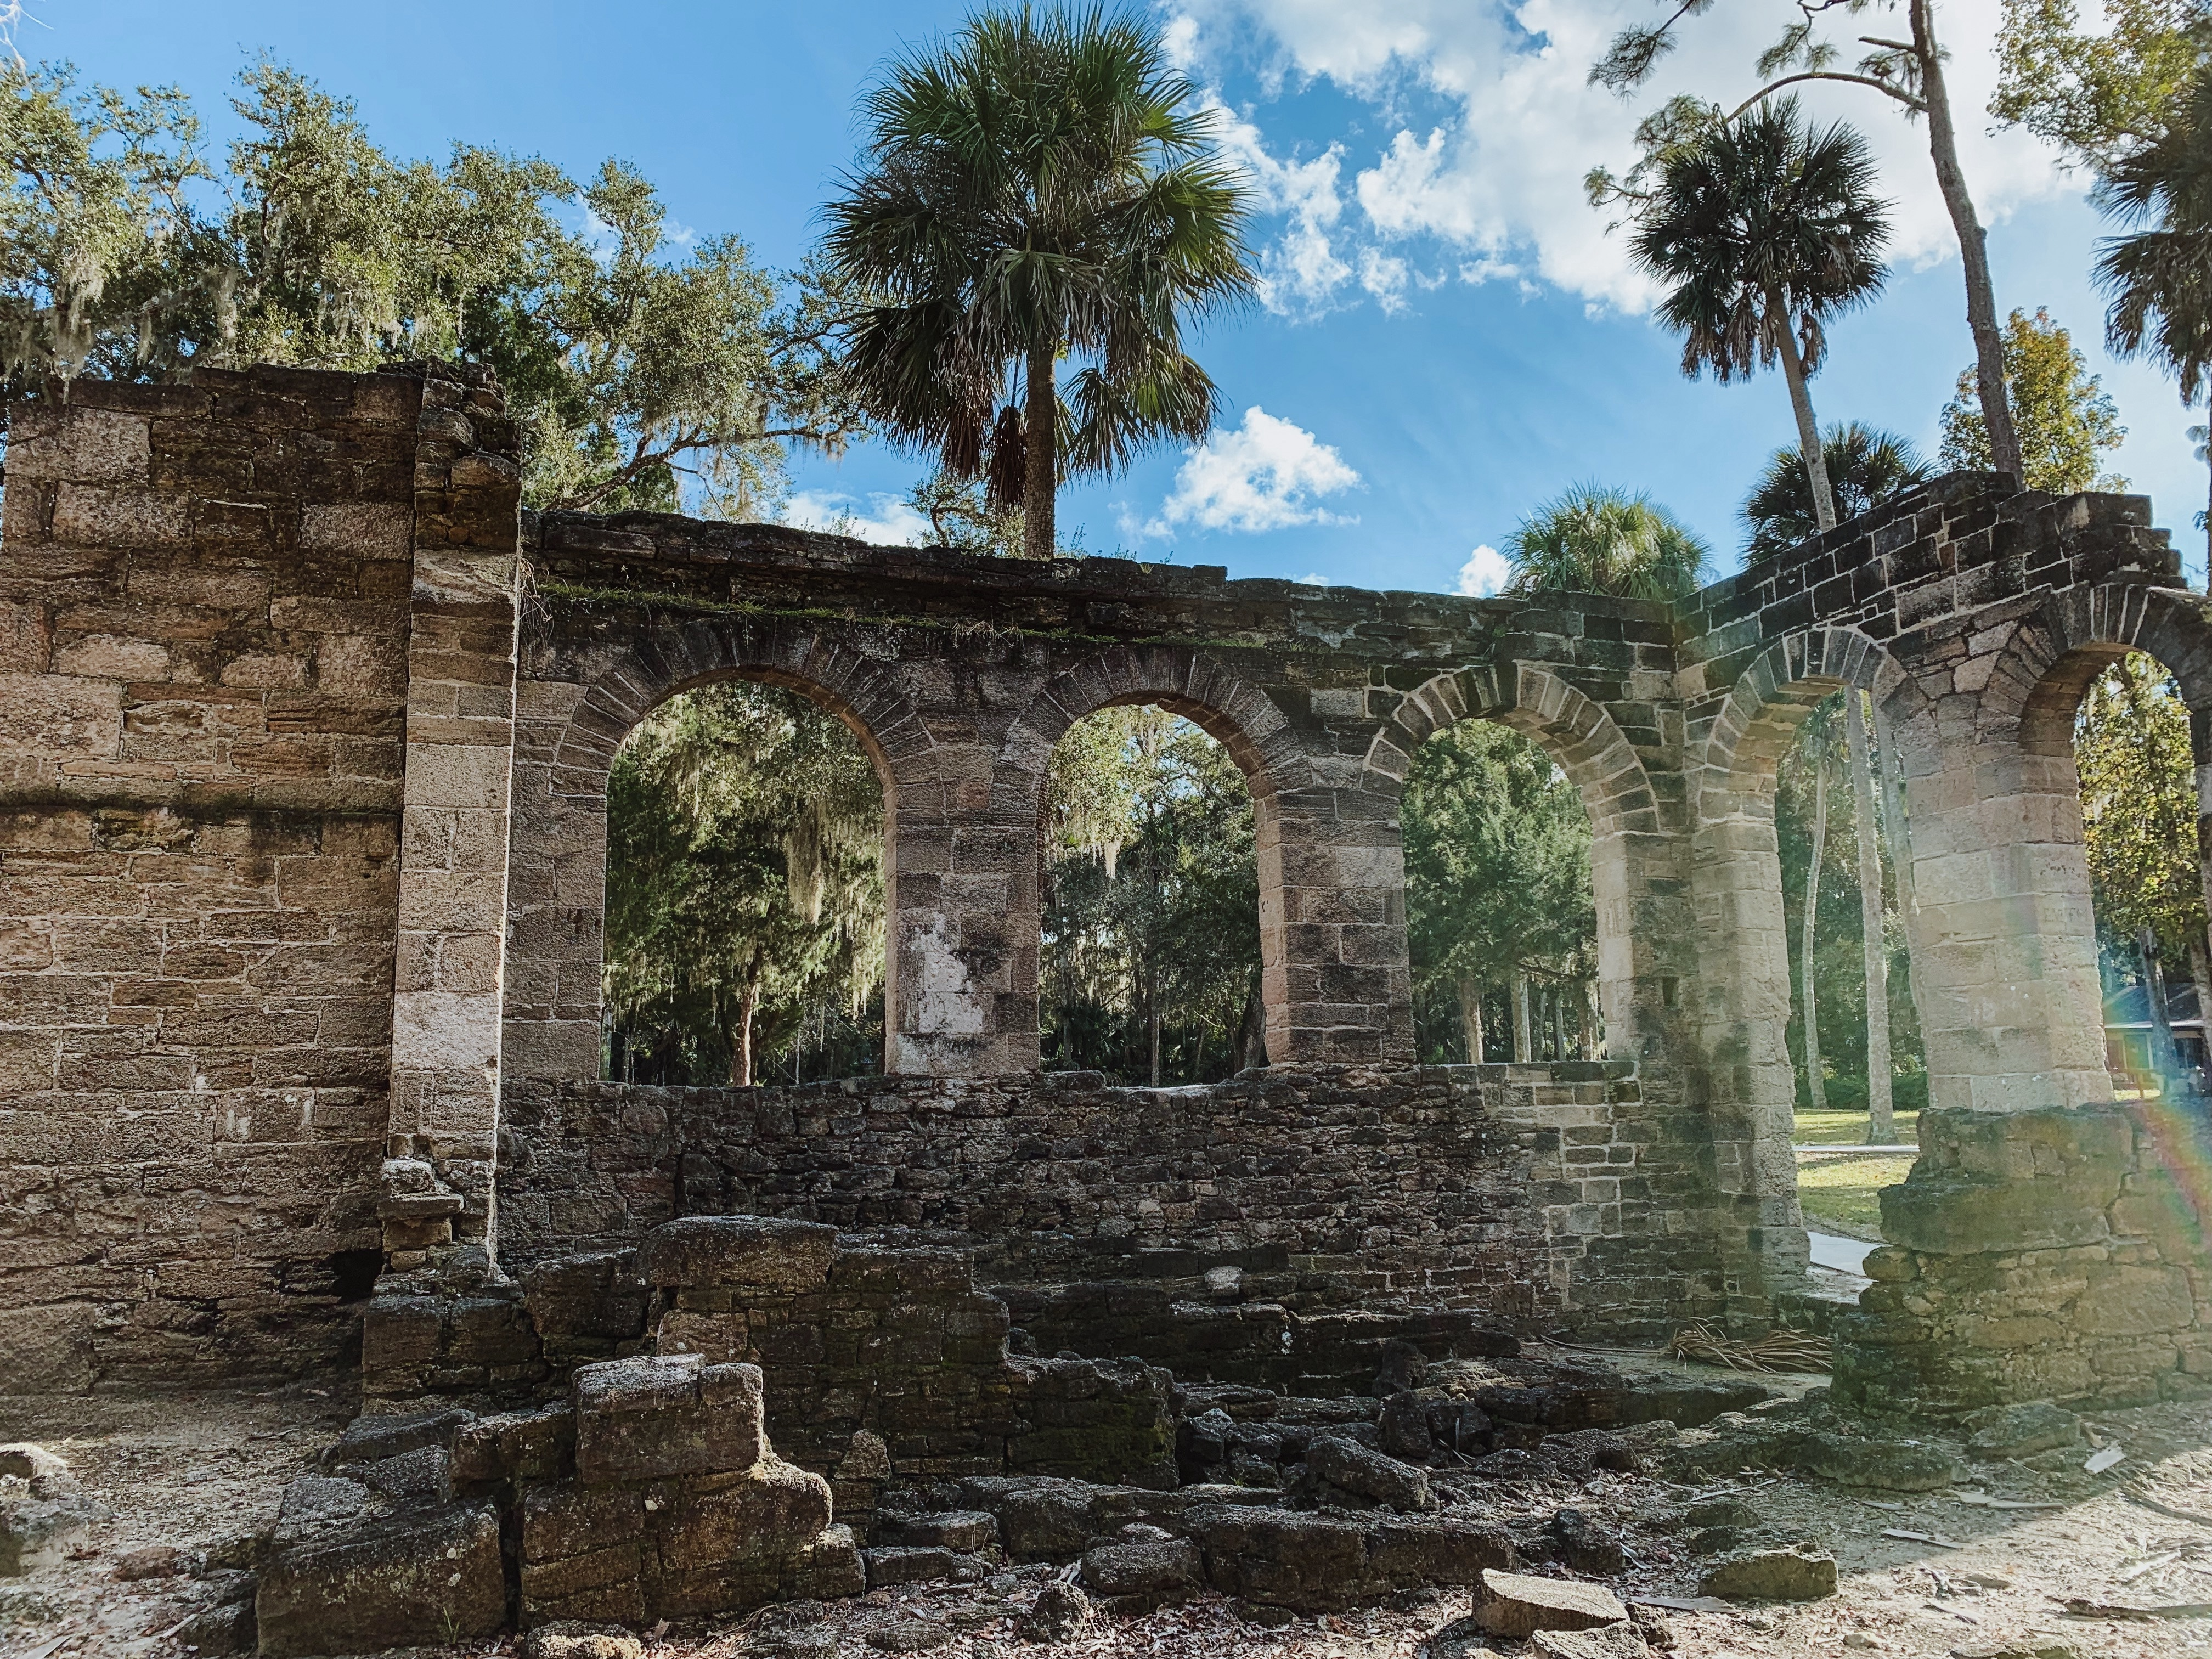 New Smyrna Beach Sugar Mill Plantation Ruins